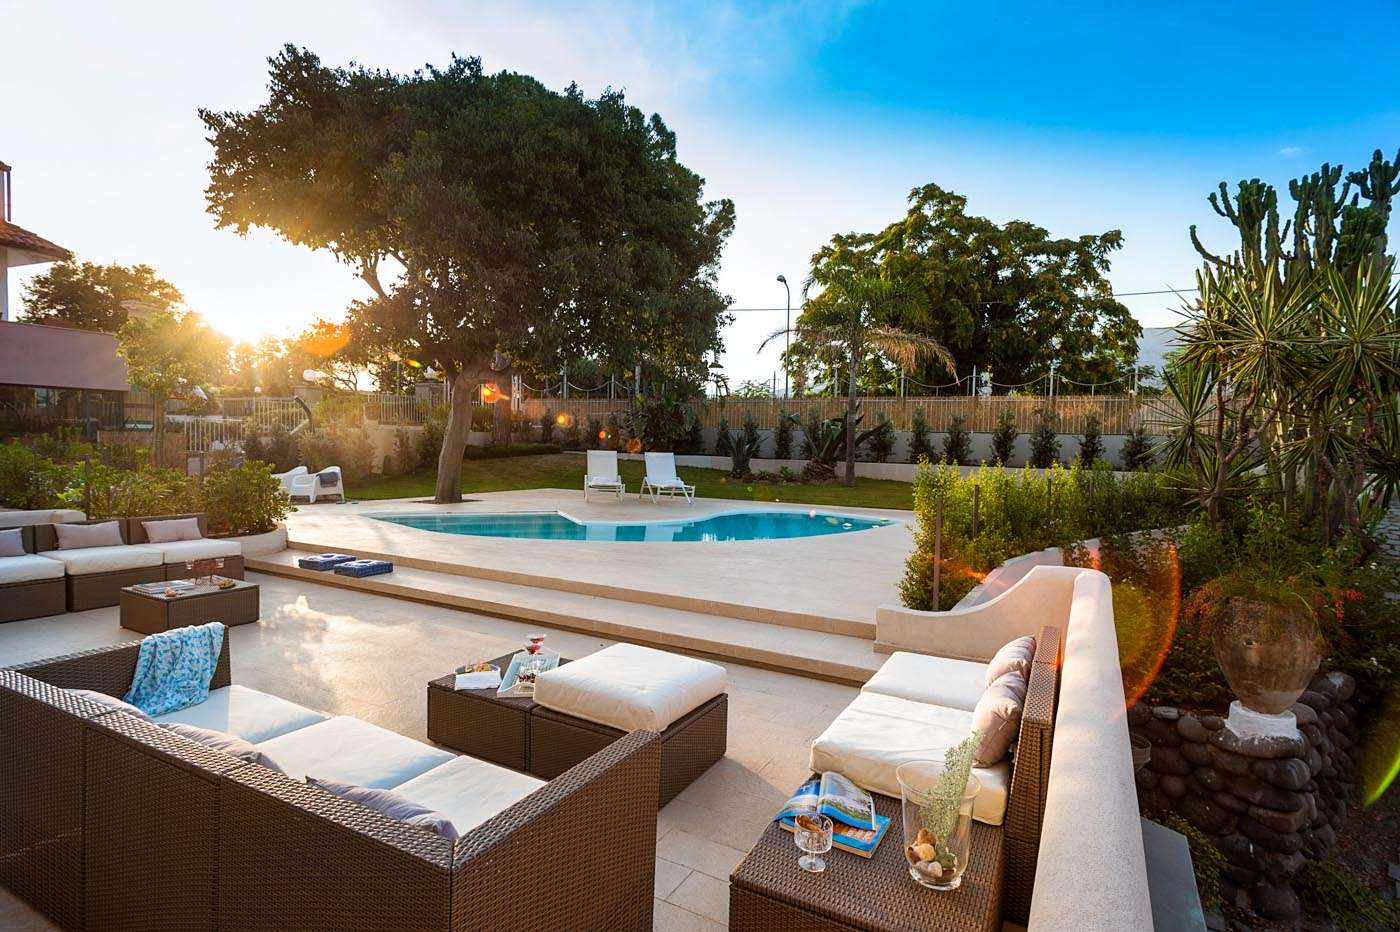 Luxury vacation rentals europe - Italy - Sicily - Taormina - Naxos - Image 1/22